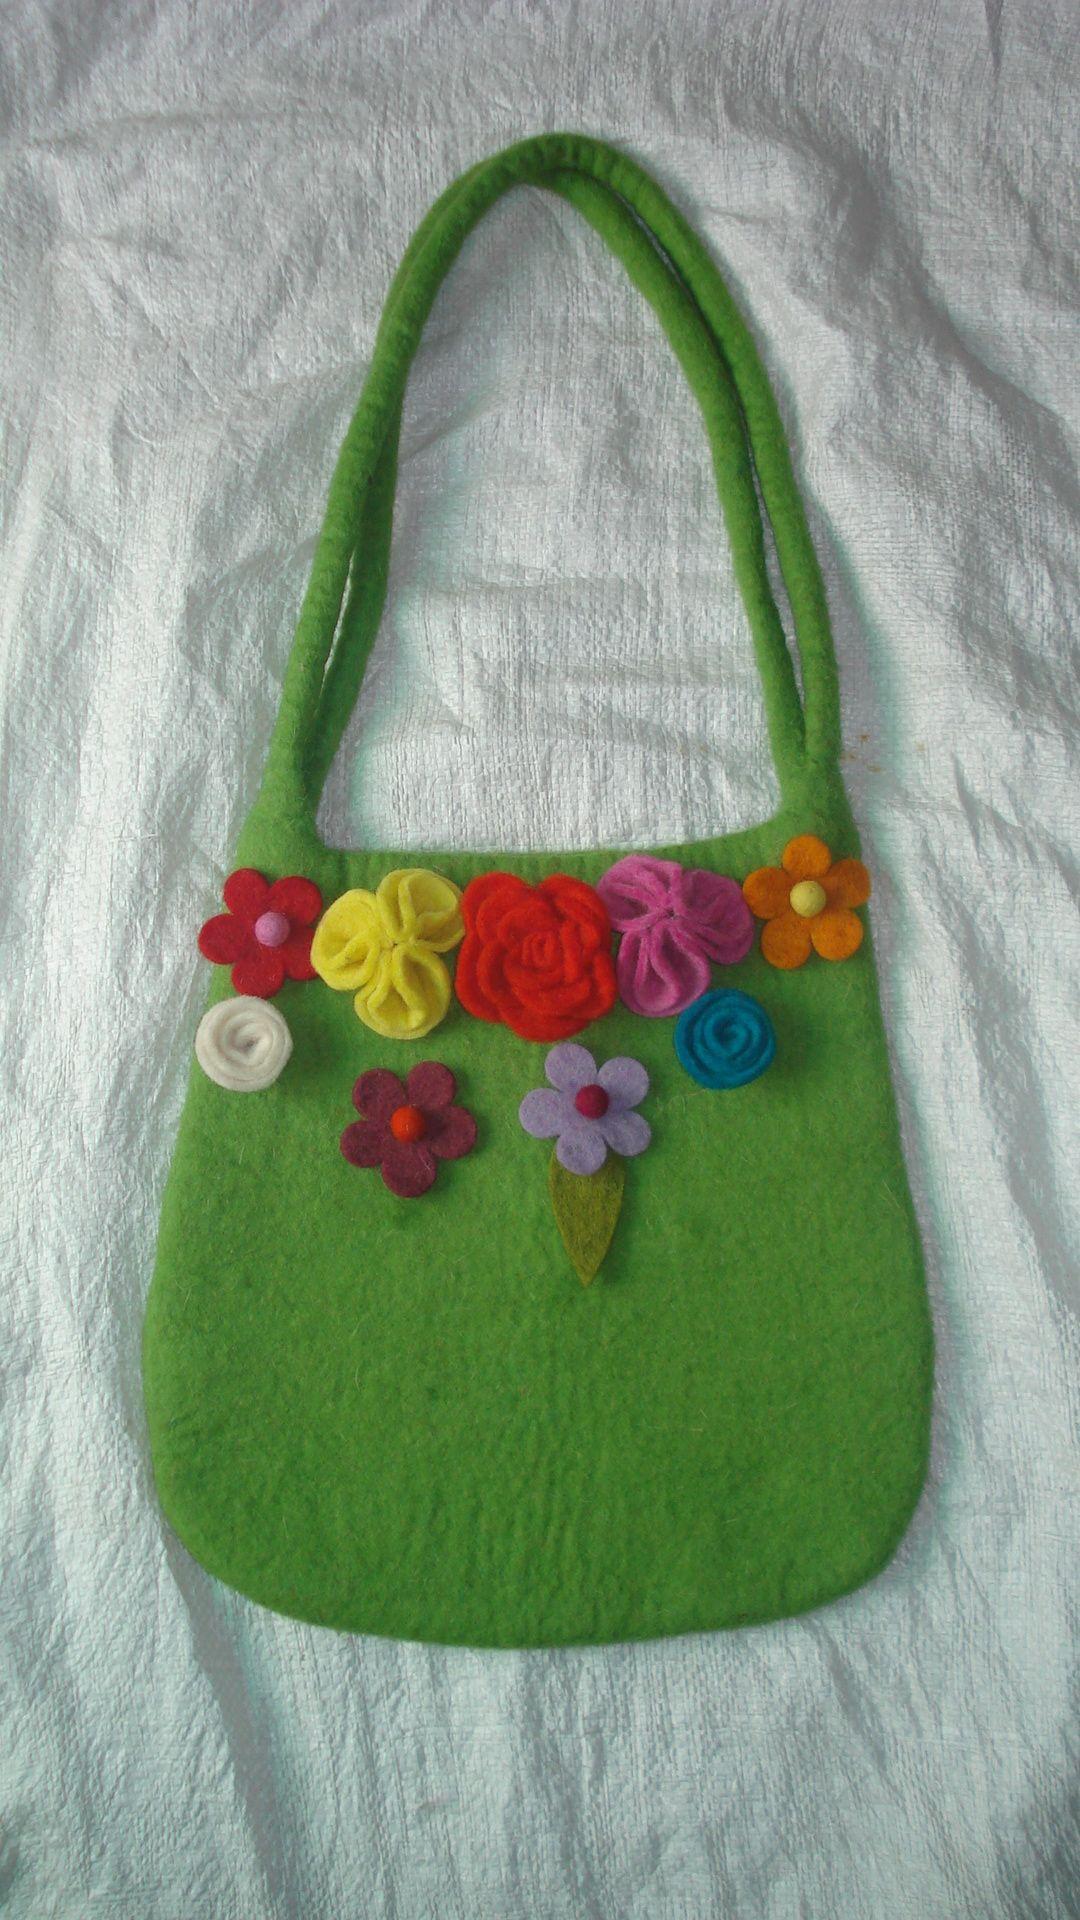 Felt Craft Ideas For Kids Part - 40: Felt Wool DIY U0026 Crafts Felt Wool Craft Handicraft Felt Craft Supplies Felt  Craft Design Felt Craft Patterns Felt Craft Ideas Felt Craft For Kids Felt  Craft ...